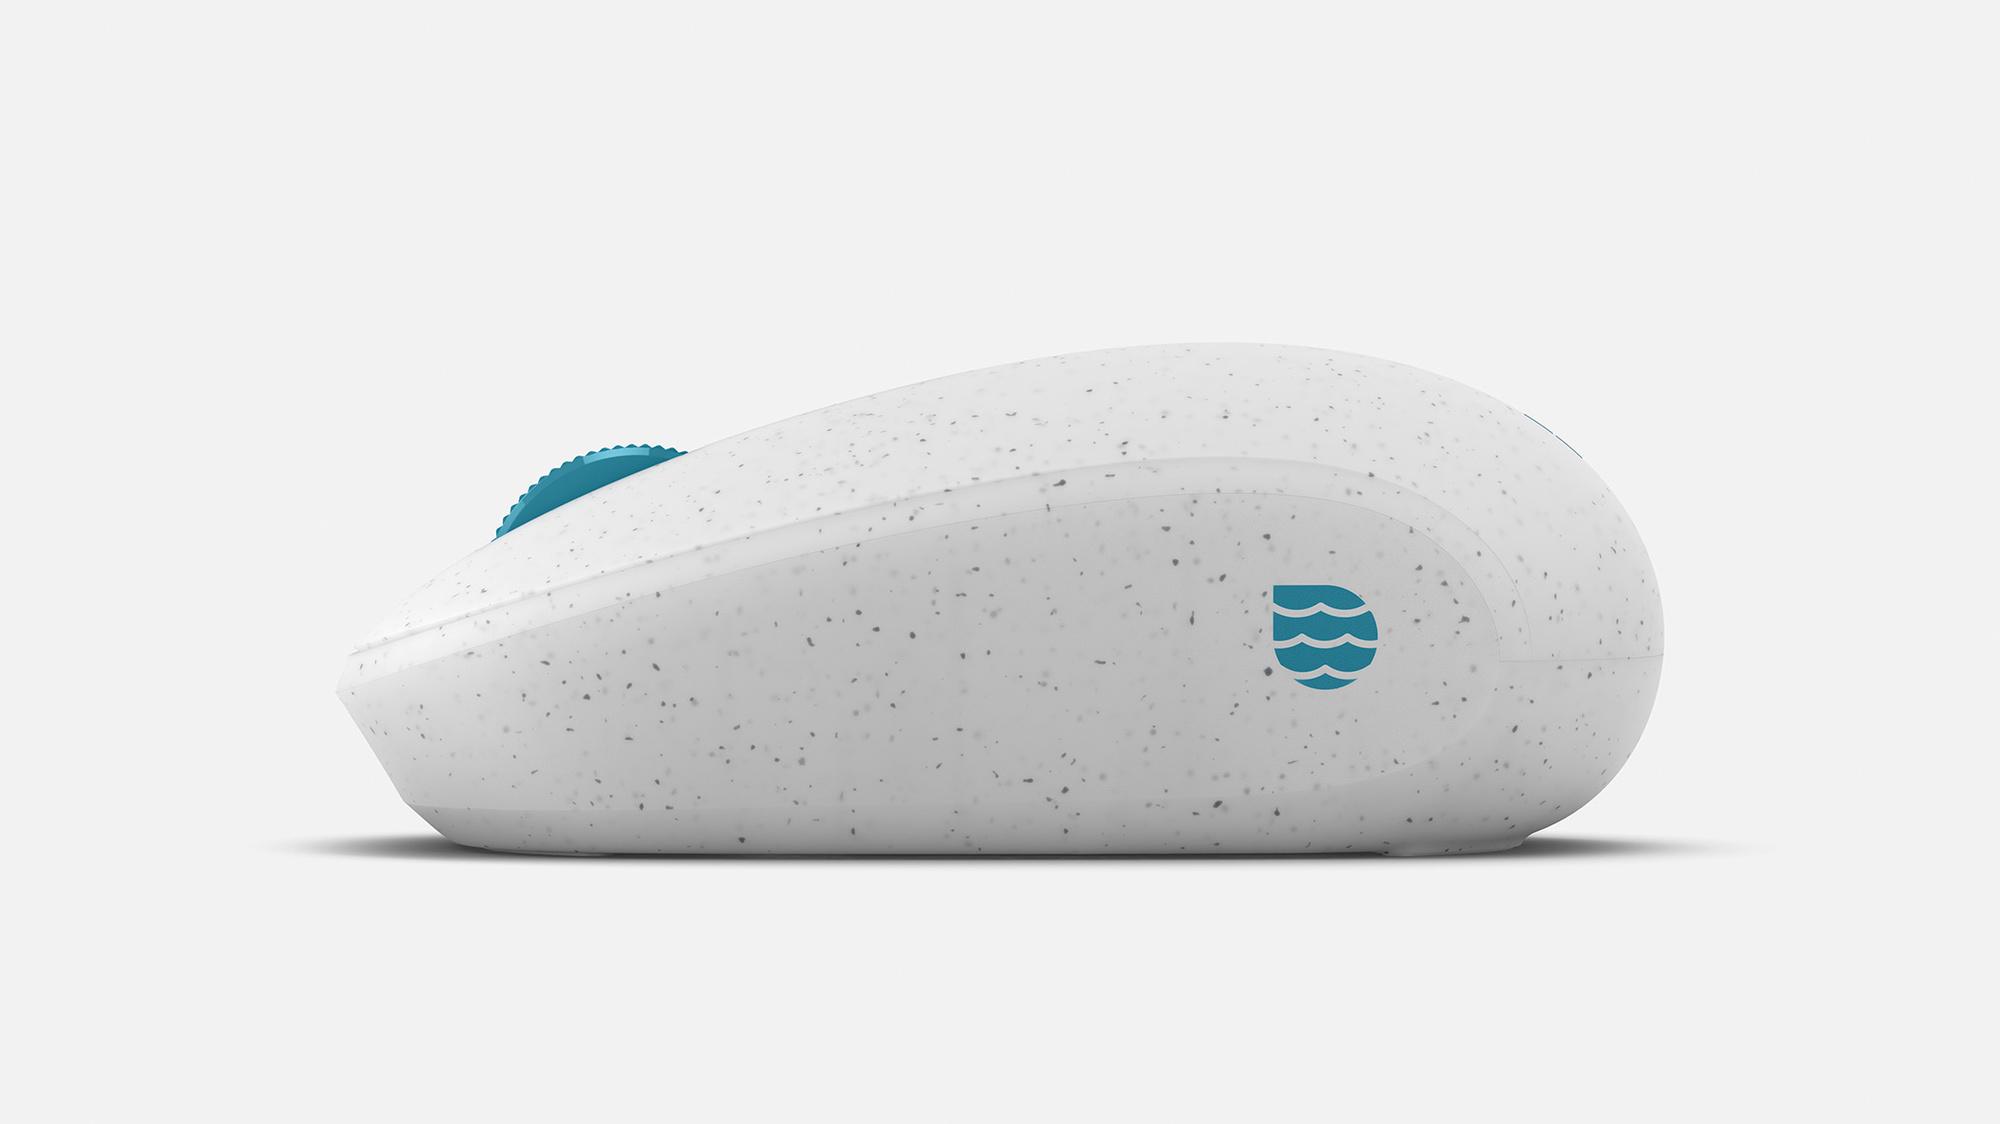 Ocean Plastic Mouse, Microsoft